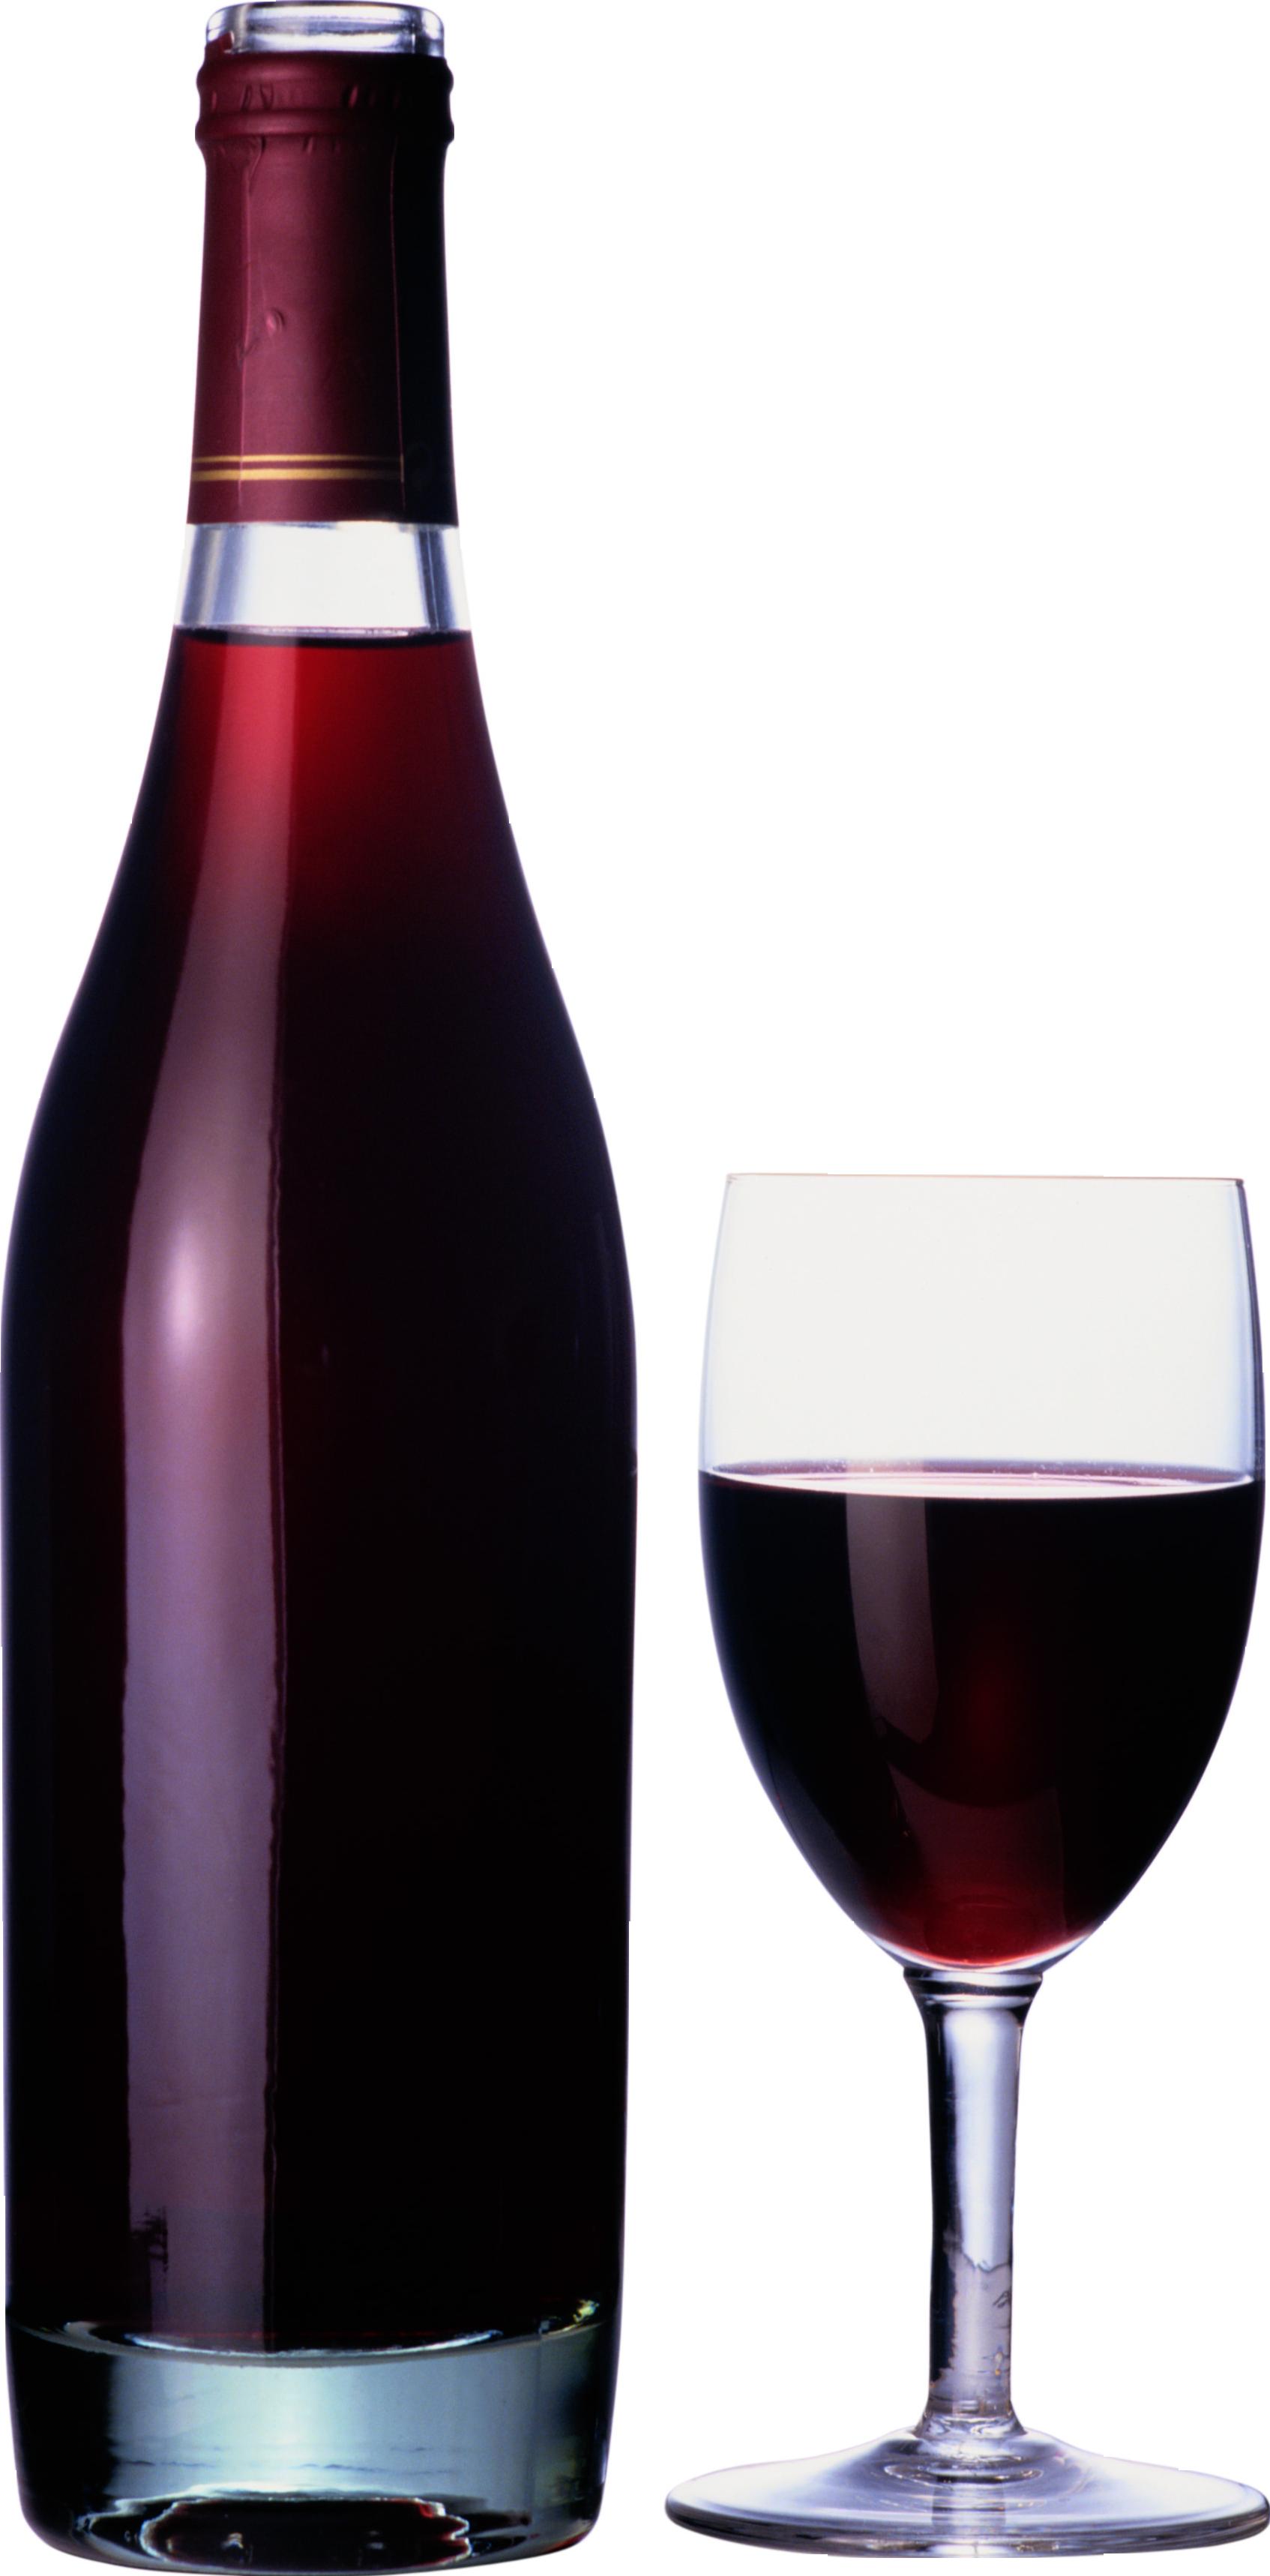 Wine hi resolution clipart image transparent download PNG Wine Bottle And Glass Transparent Wine Bottle And Glass ... image transparent download